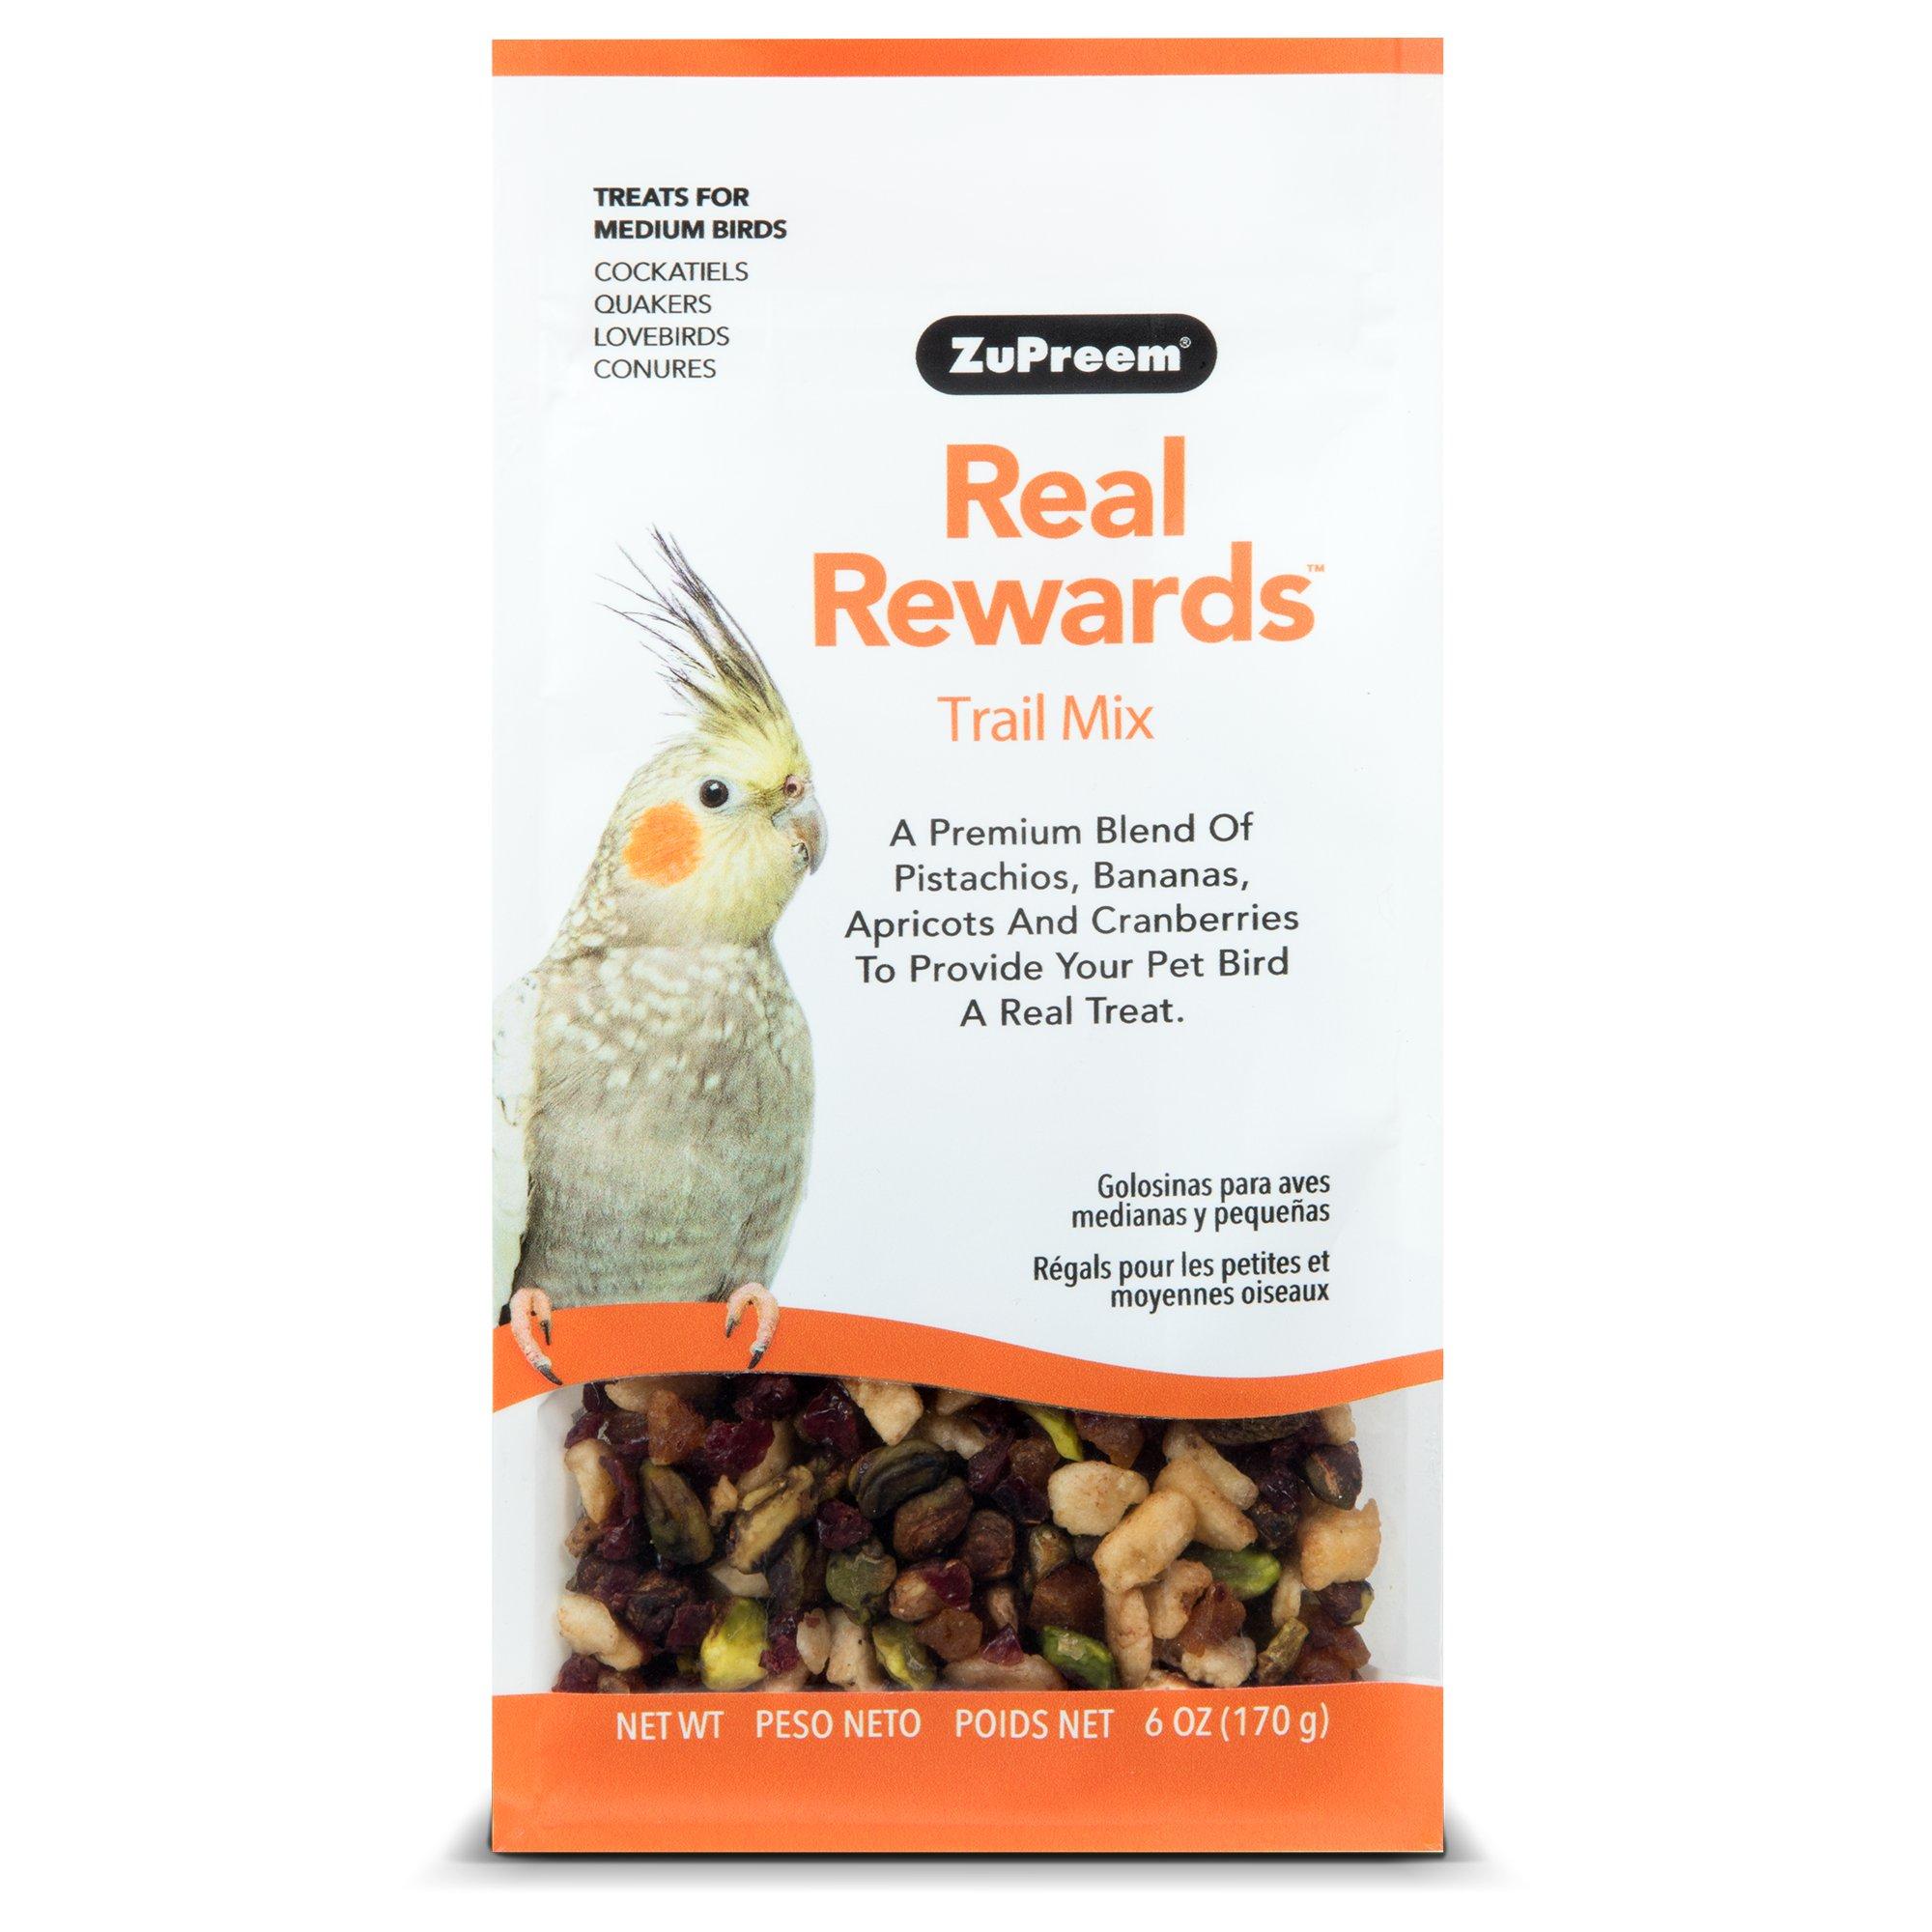 ZuPreem Real Rewards Trail Mix Treats for Medium Birds